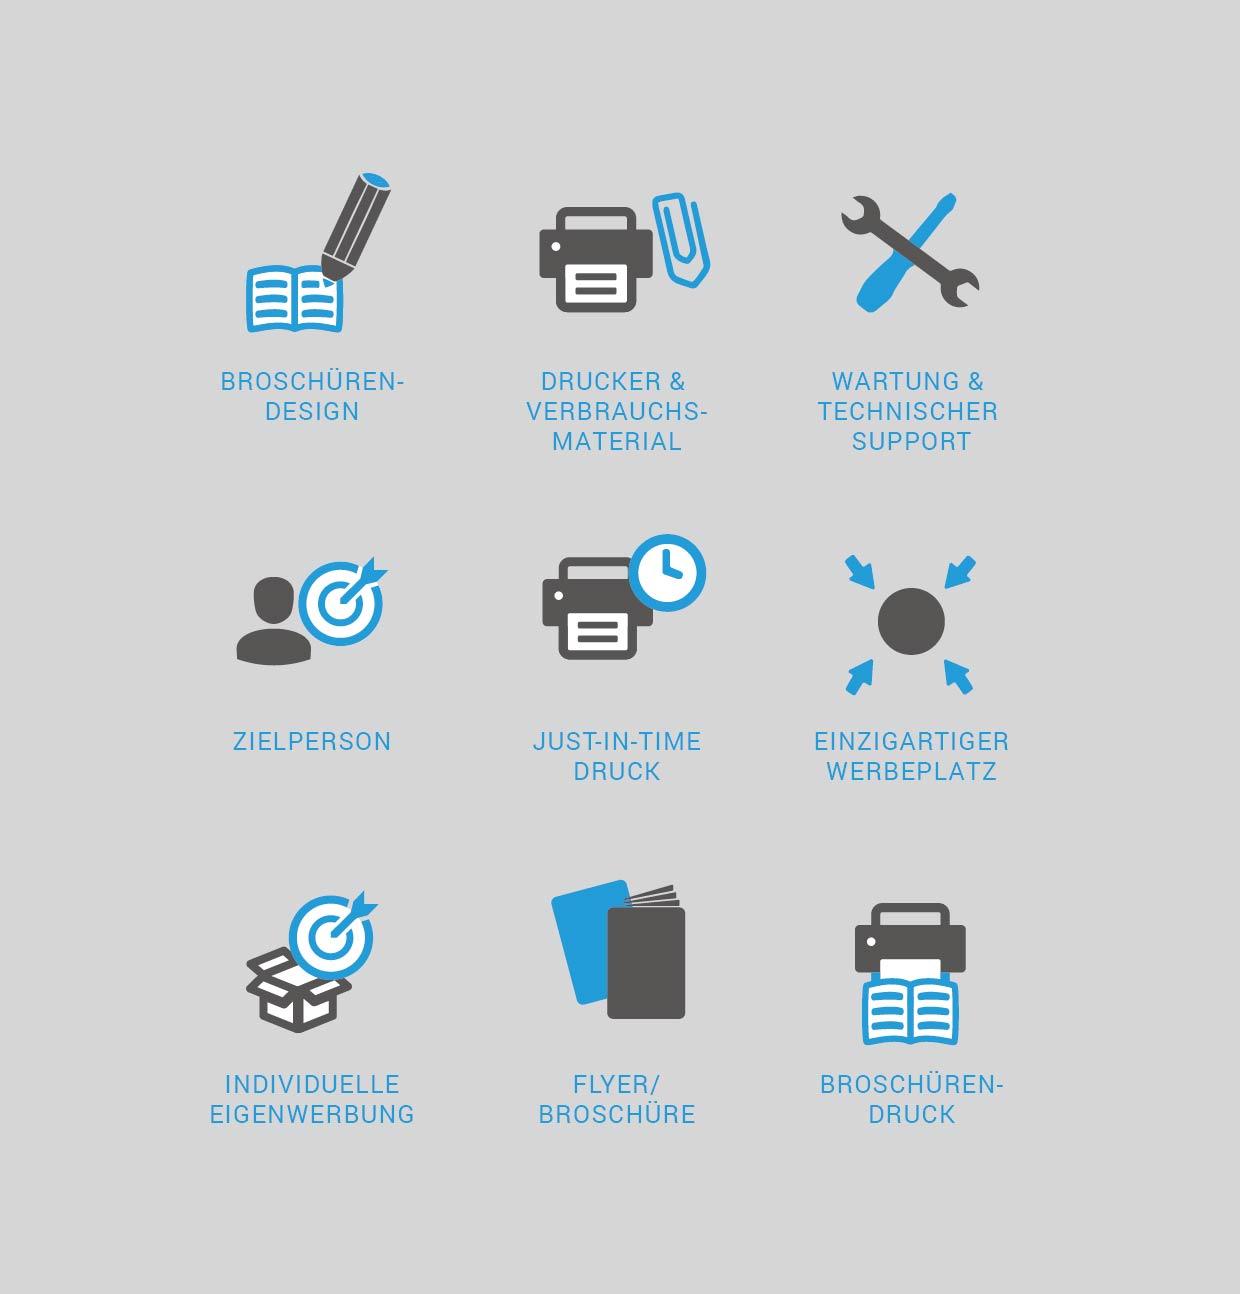 Franziska Schatz Grafik Design | Kommunikationsdesign | Editorial Design | Logo | Branding | Corporate Design | Identity | Werbung | Werbeagentur | Kaufbeuren | Allgäu, Logo, Corporate Design, Corporate Identity, Unternehmensgestaltung, Massage, Yoga, Pilates, Praxis, Arzt, Friesenried, Ostallgäu